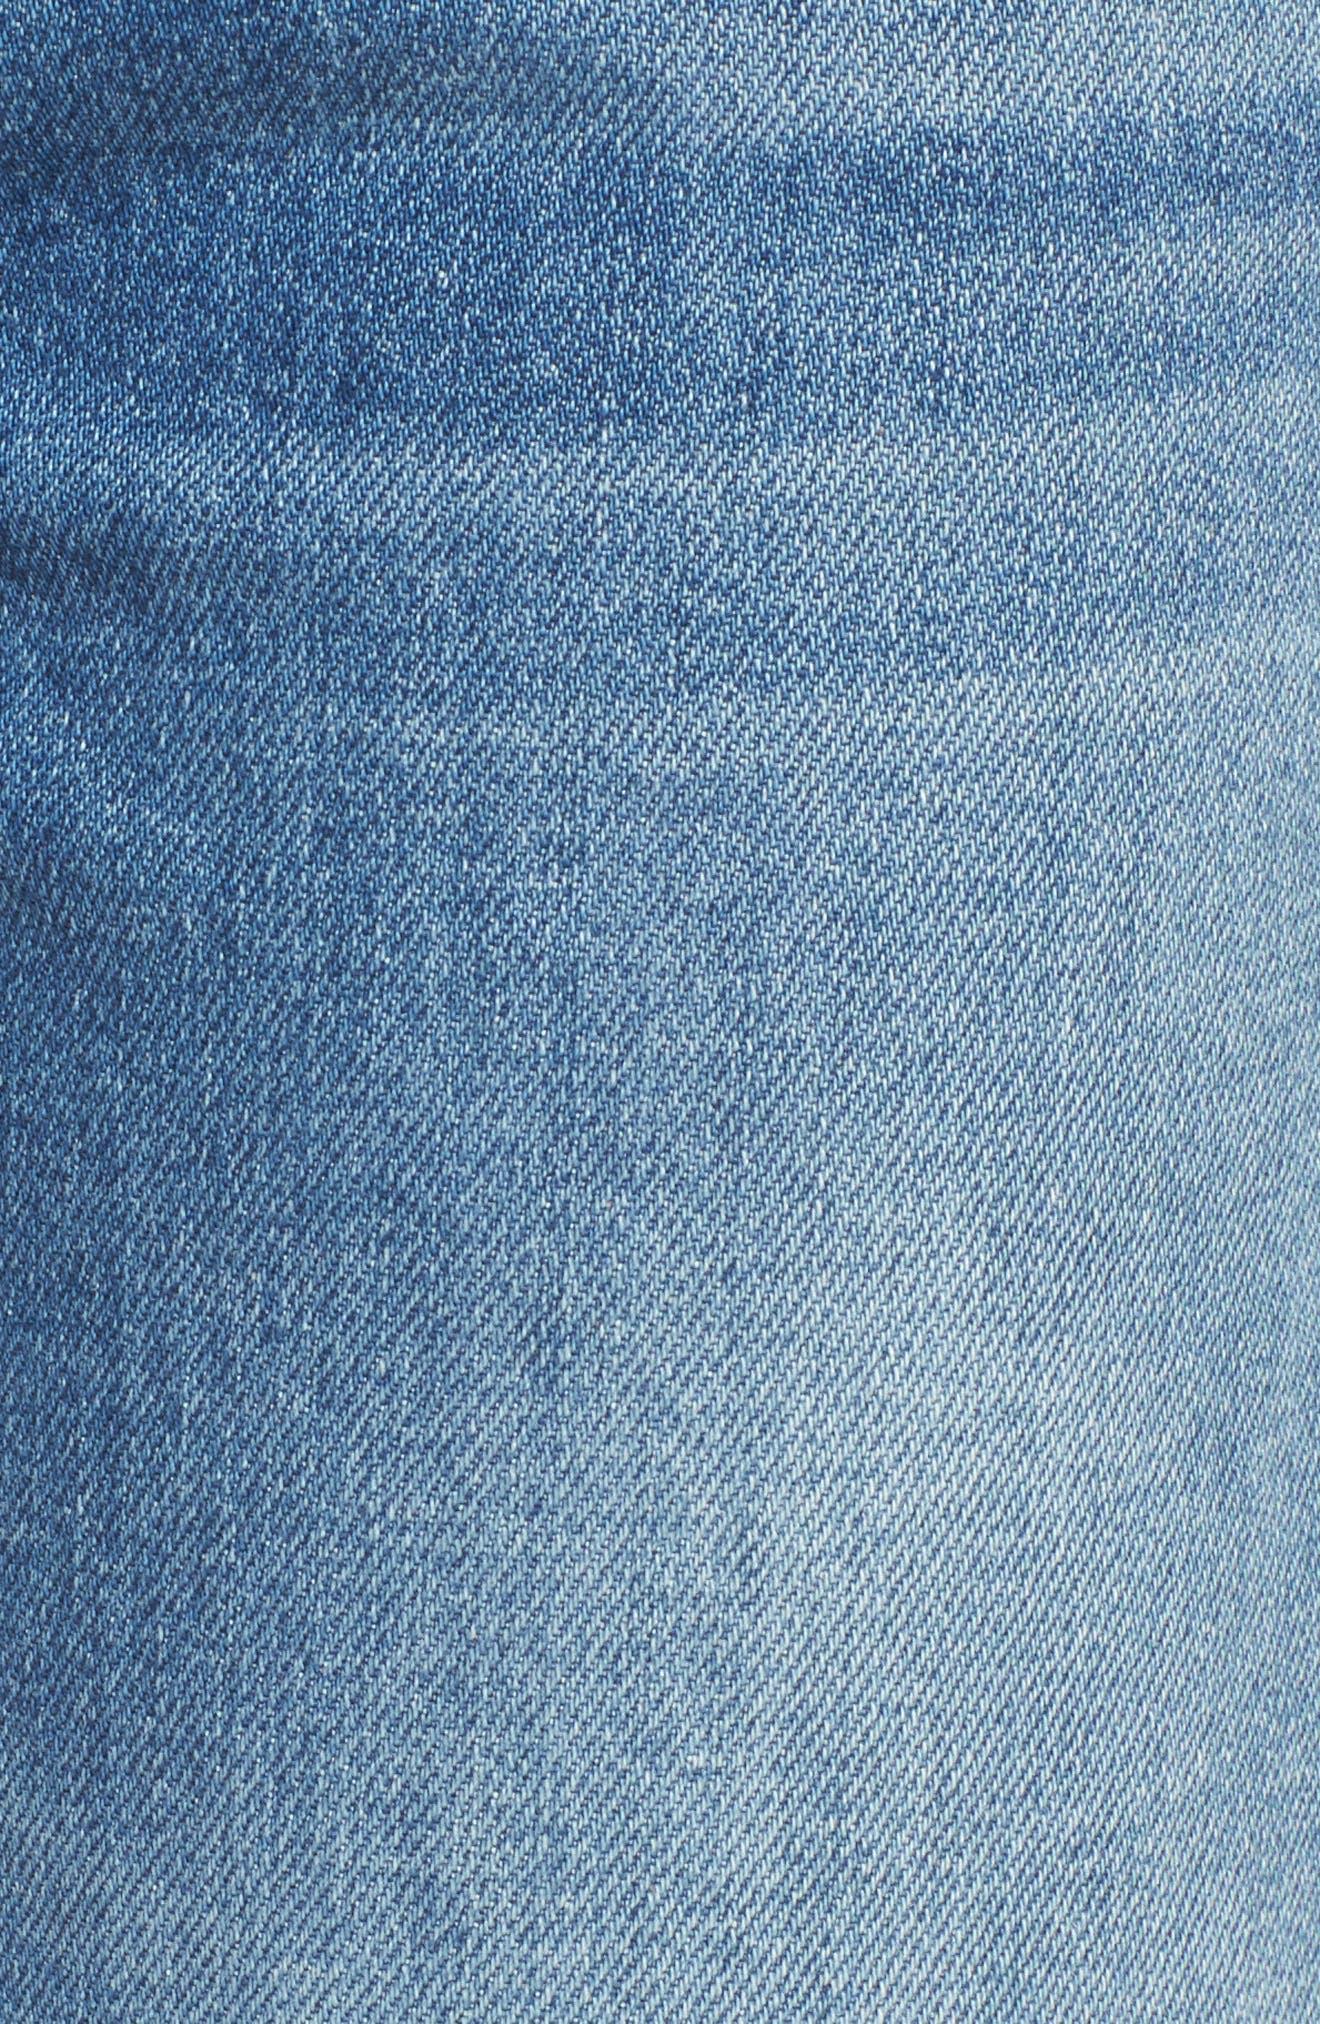 Edie Pieced Hem Cropped Jeans,                             Alternate thumbnail 6, color,                             Vintage Blue Dunes 2